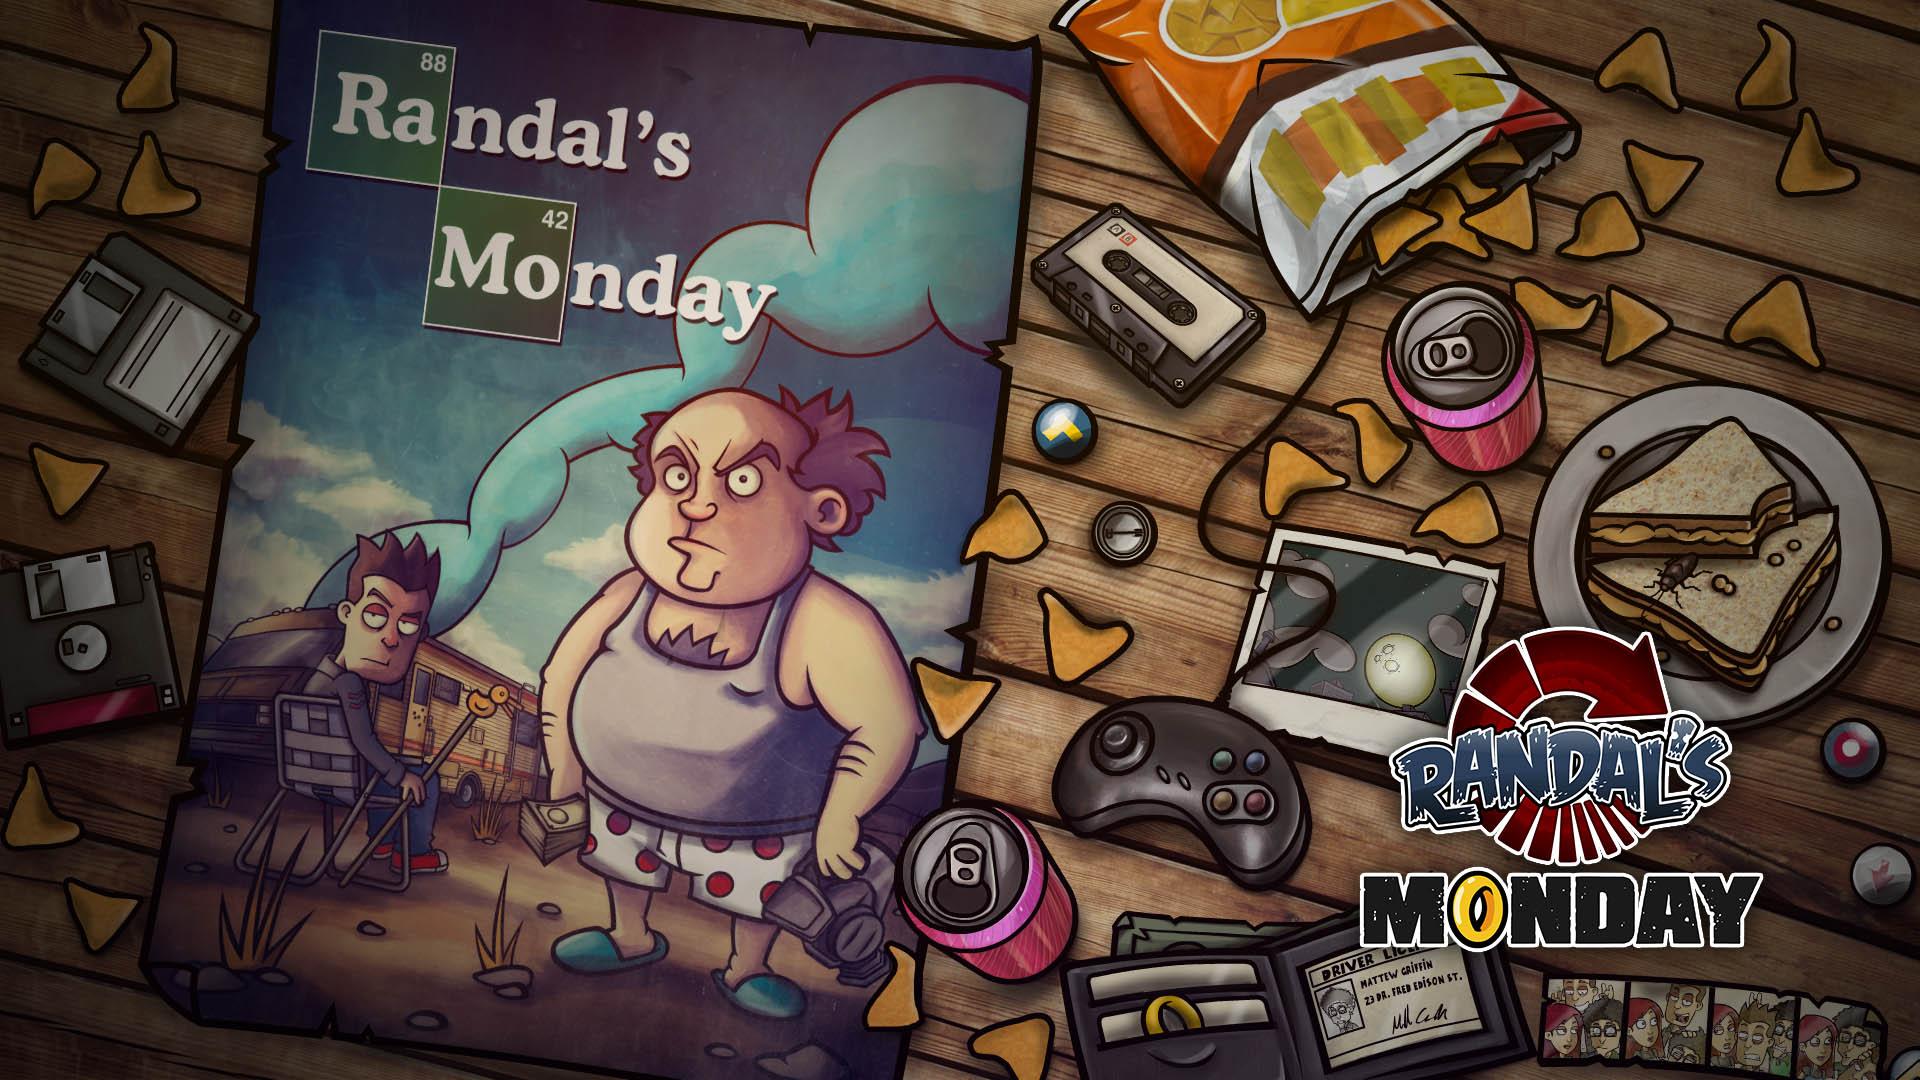 image randals monday artwork 1 jpg steam trading cards wiki